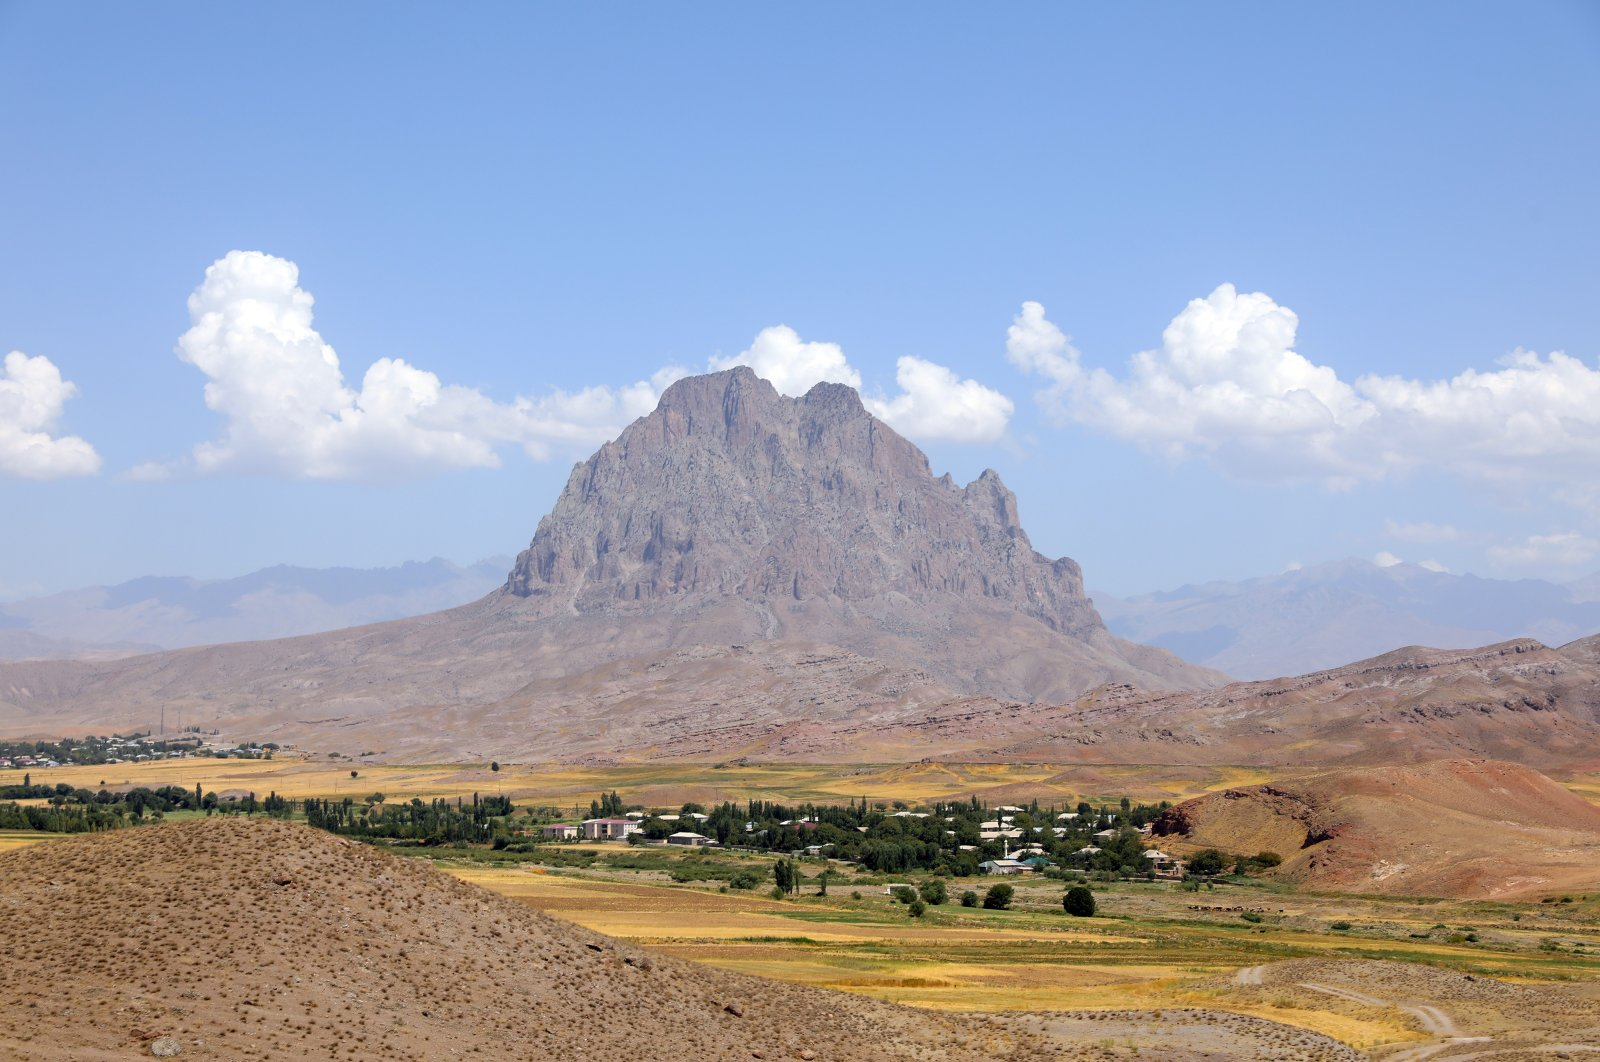 The Haçadağ mountain located in the Nakhchivan Autonomous Region, Azerbaijan, Aug. 15, 2021. (AA File Photo)